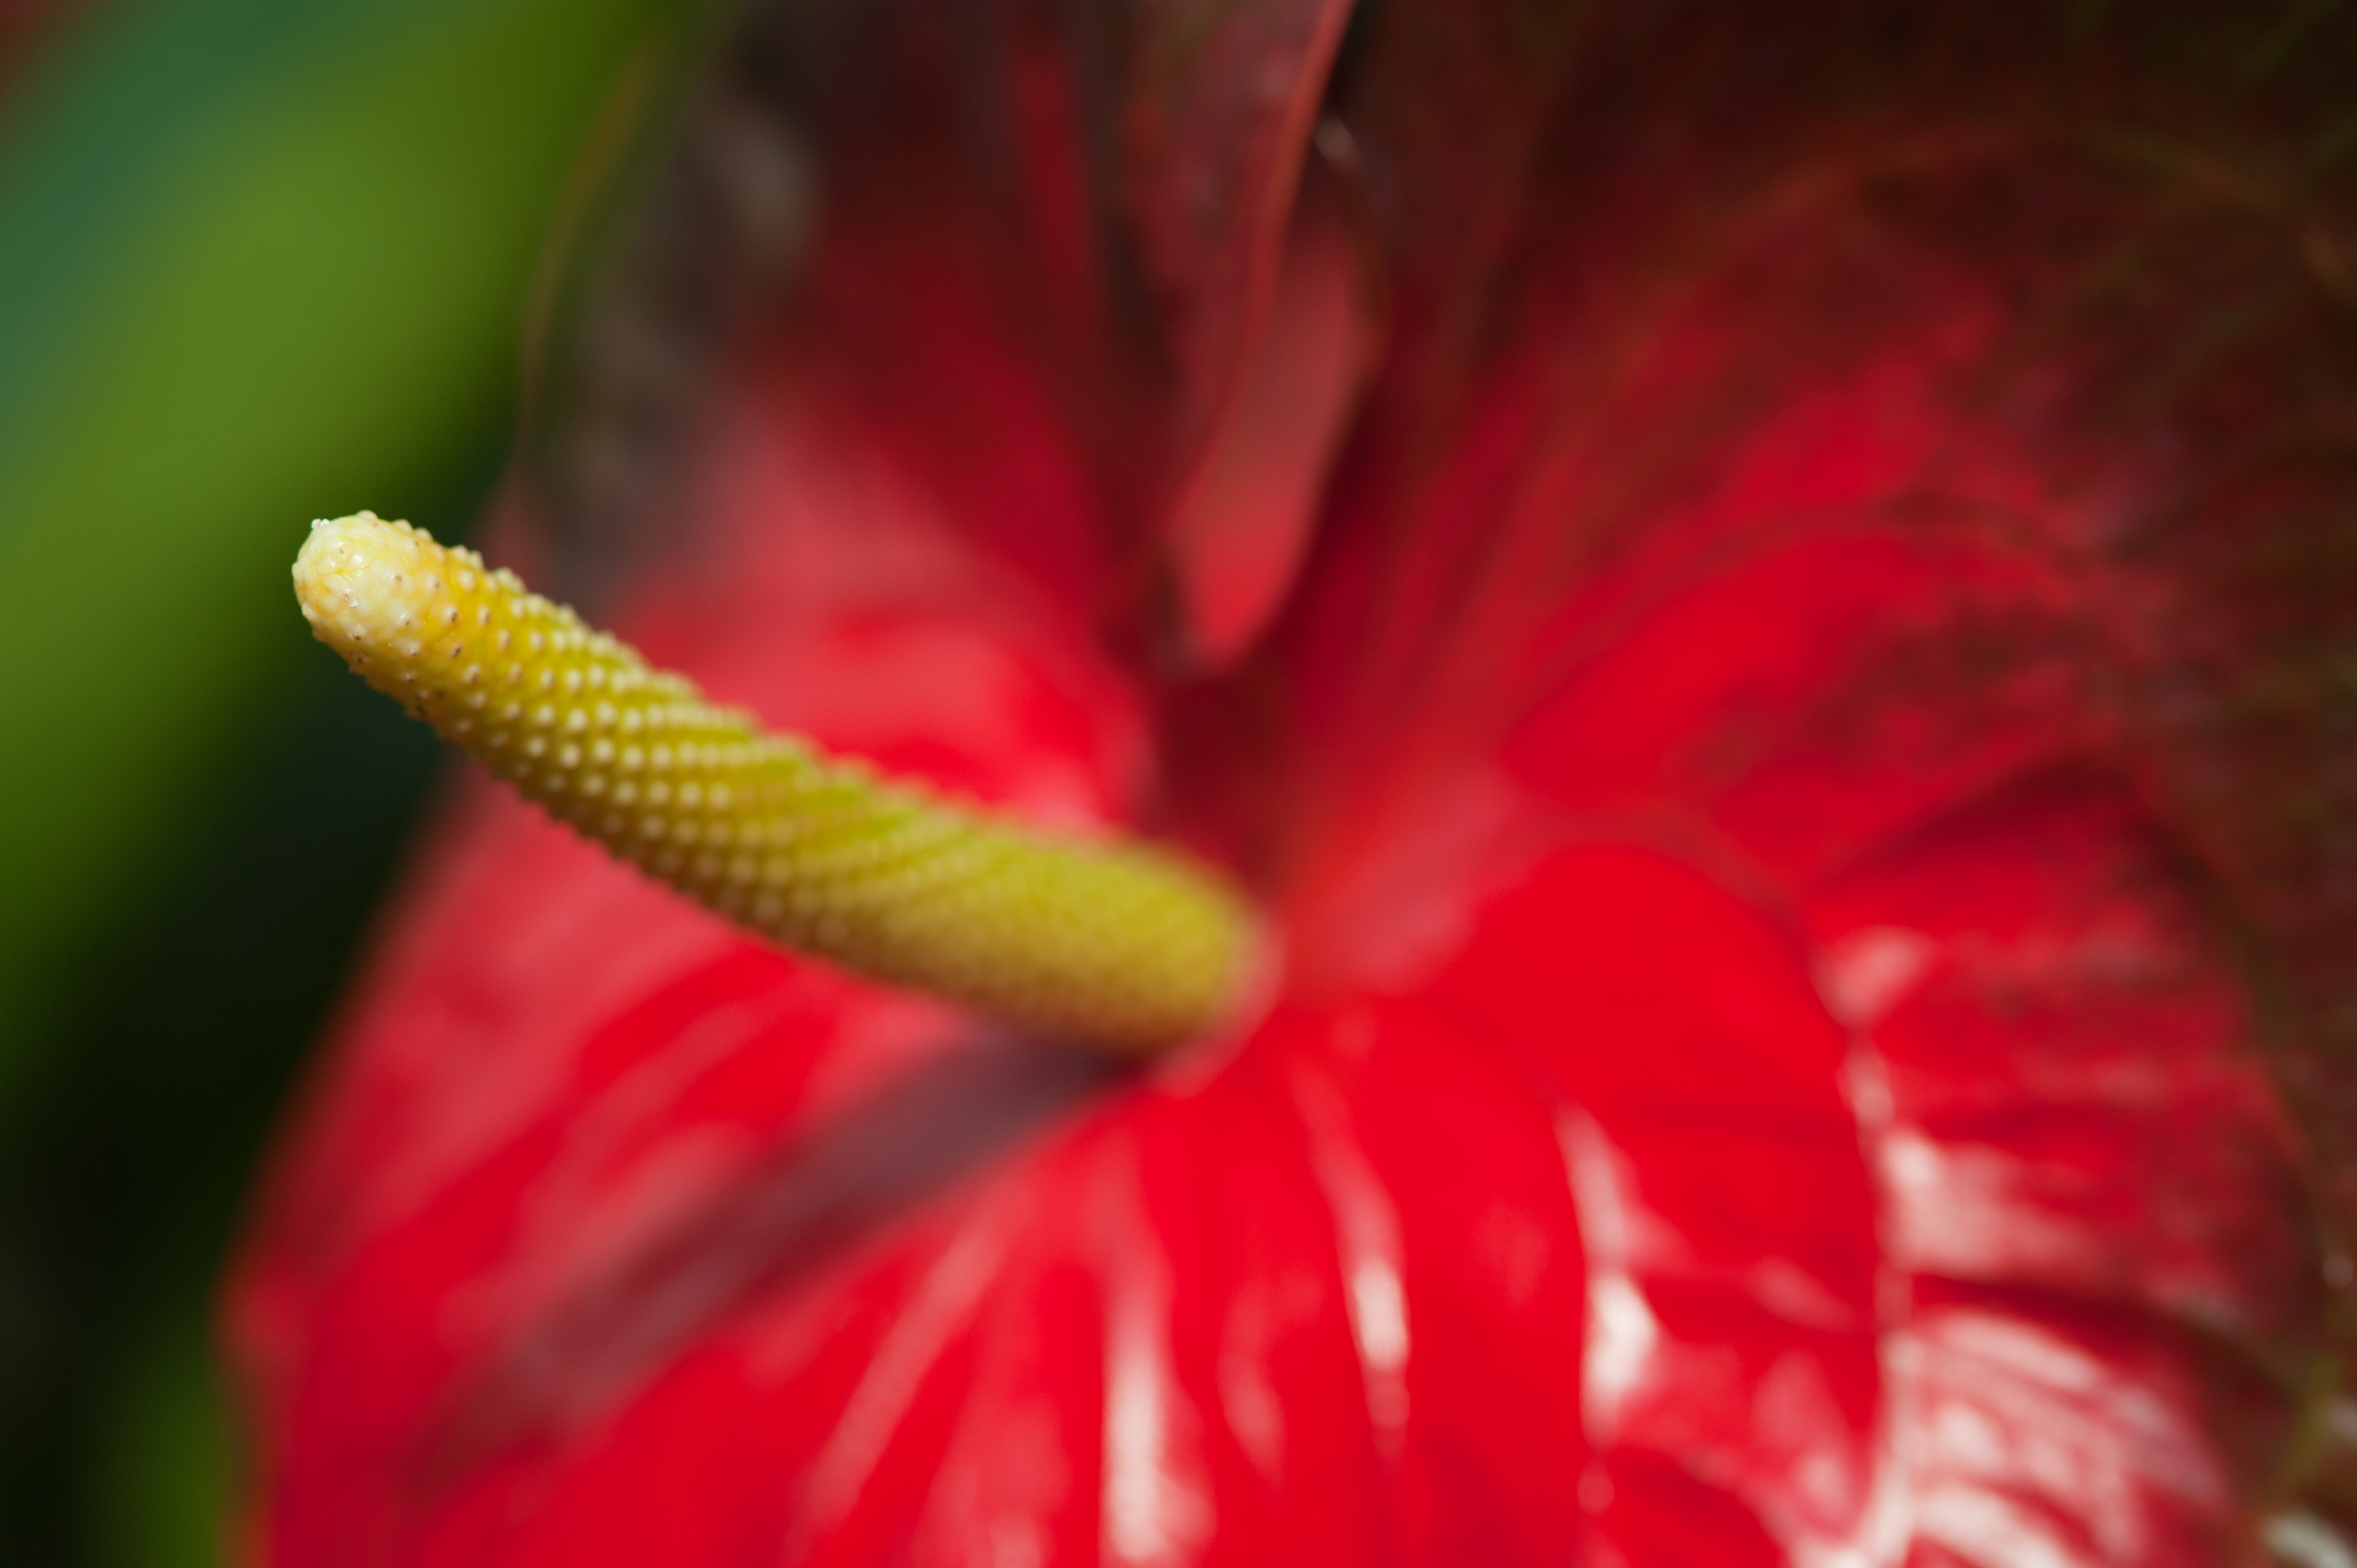 phallic plant